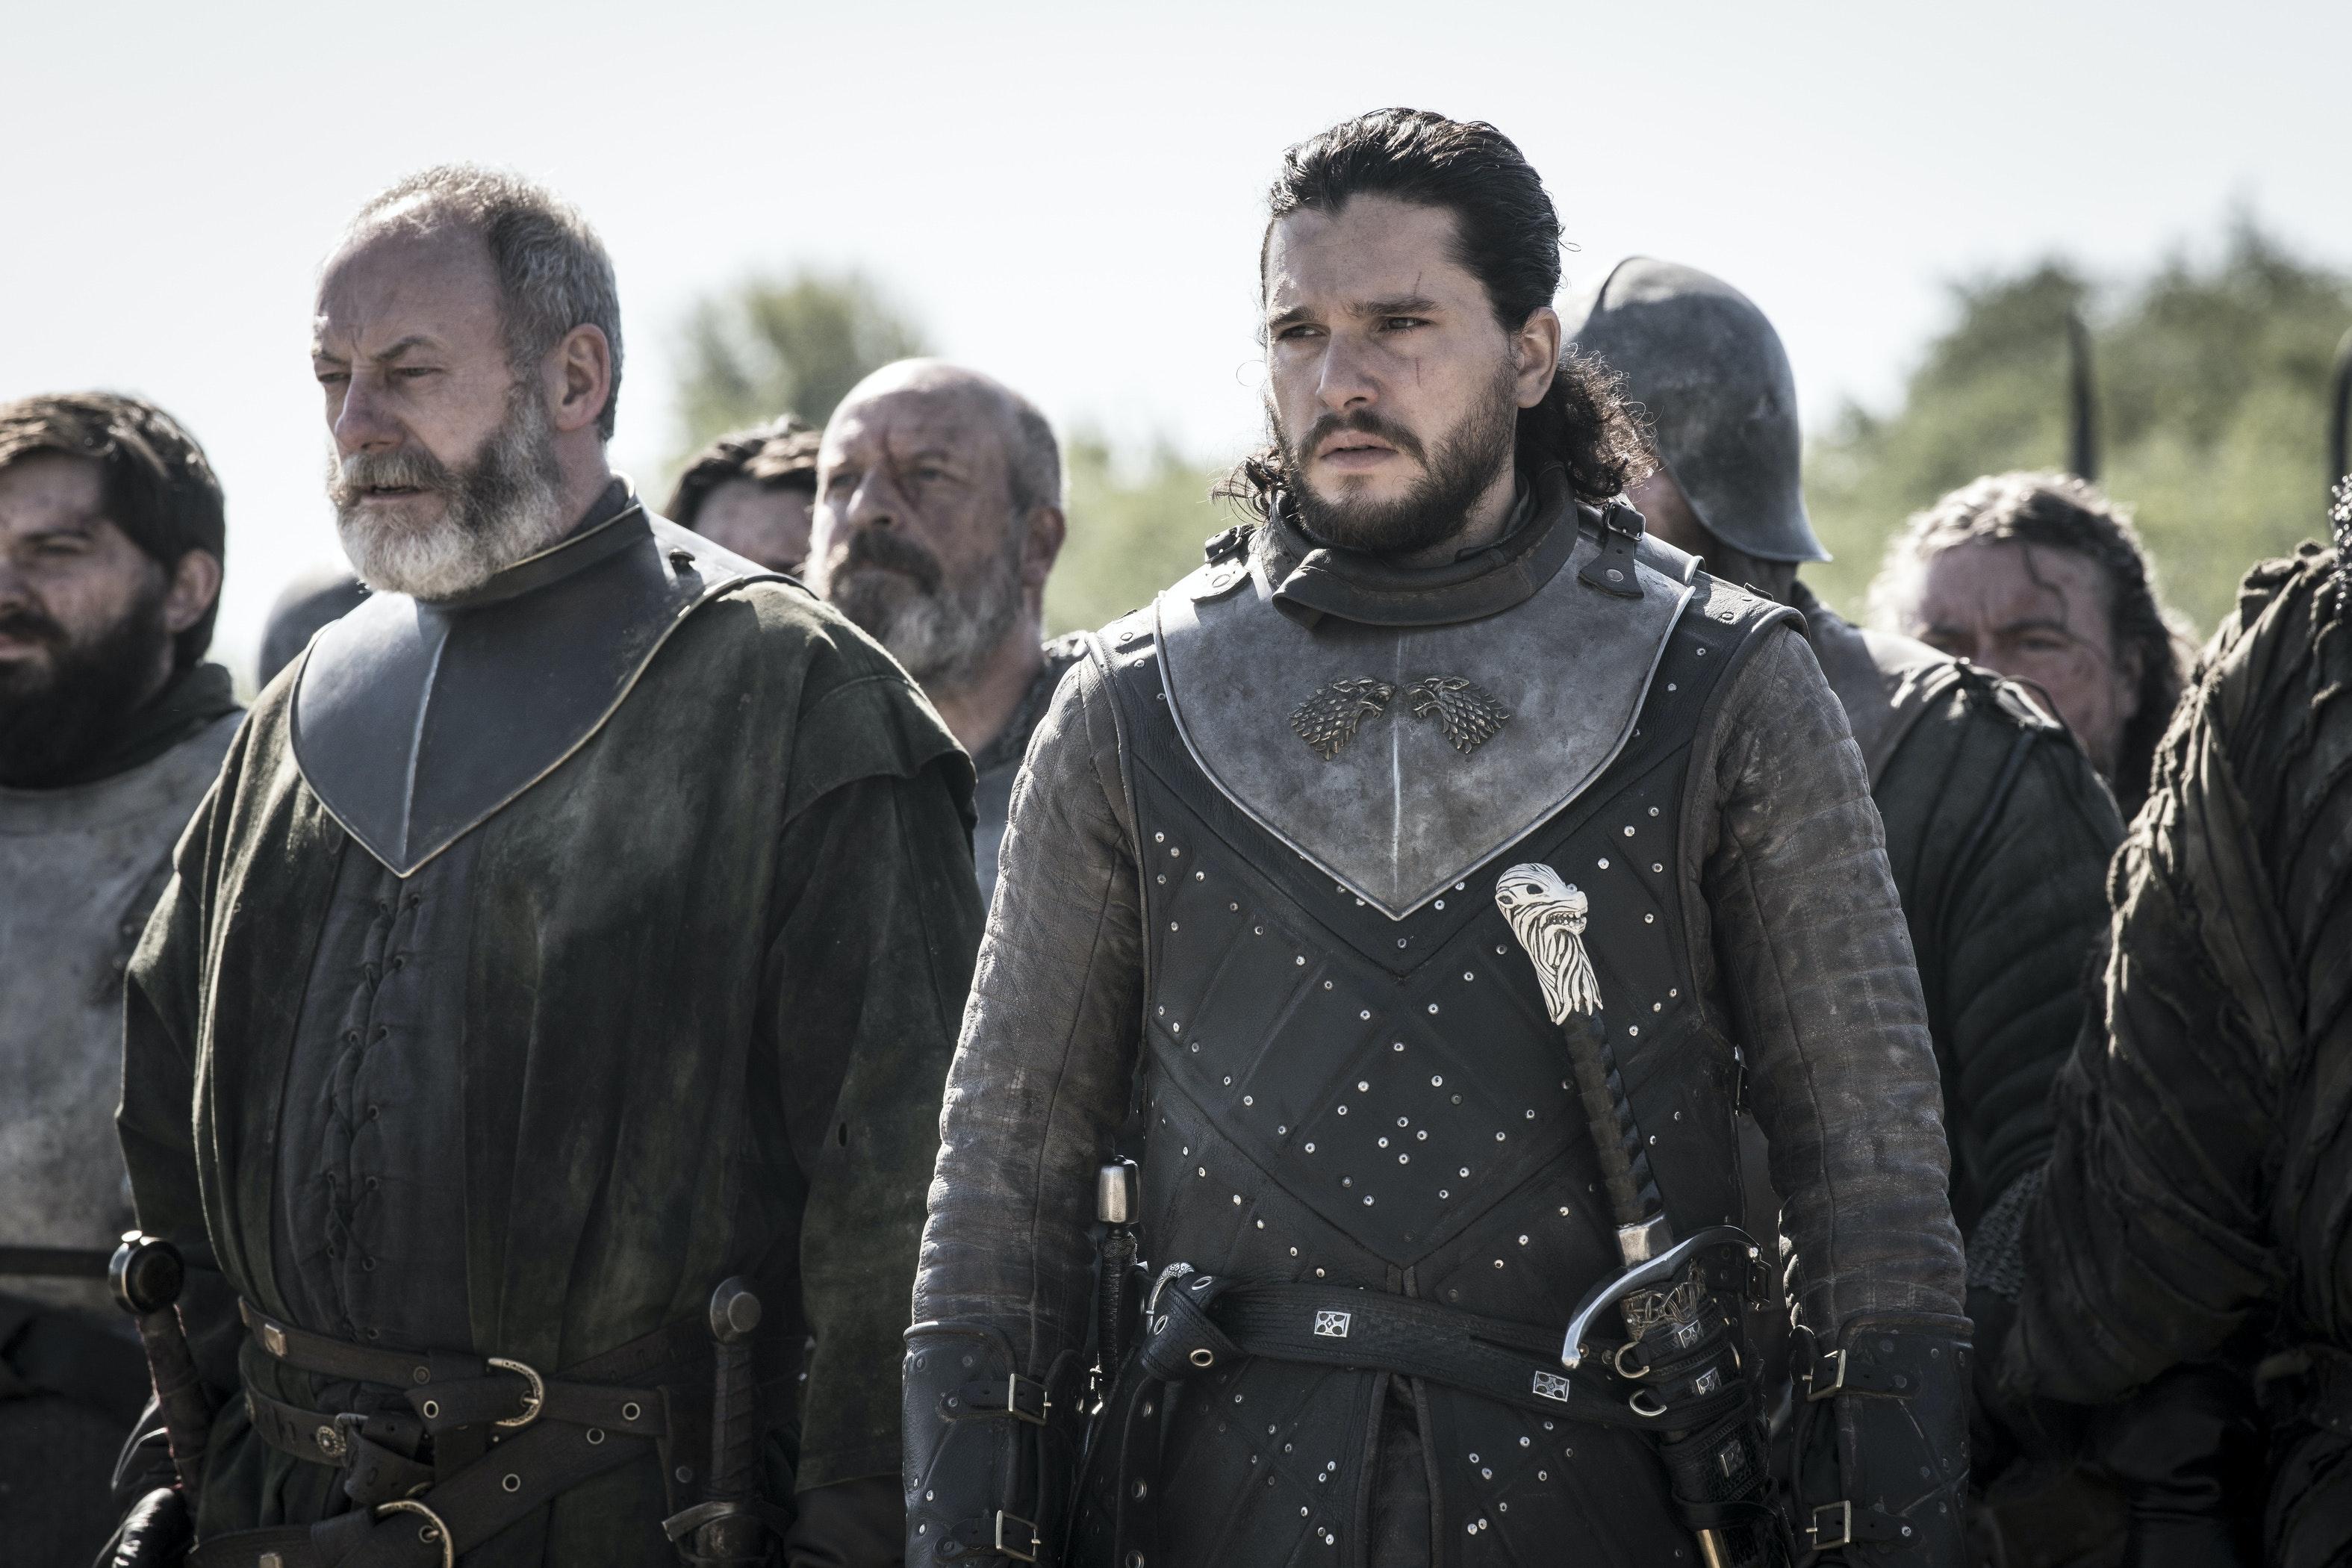 Game of thrones season 8 episode 5 live stream link reddit